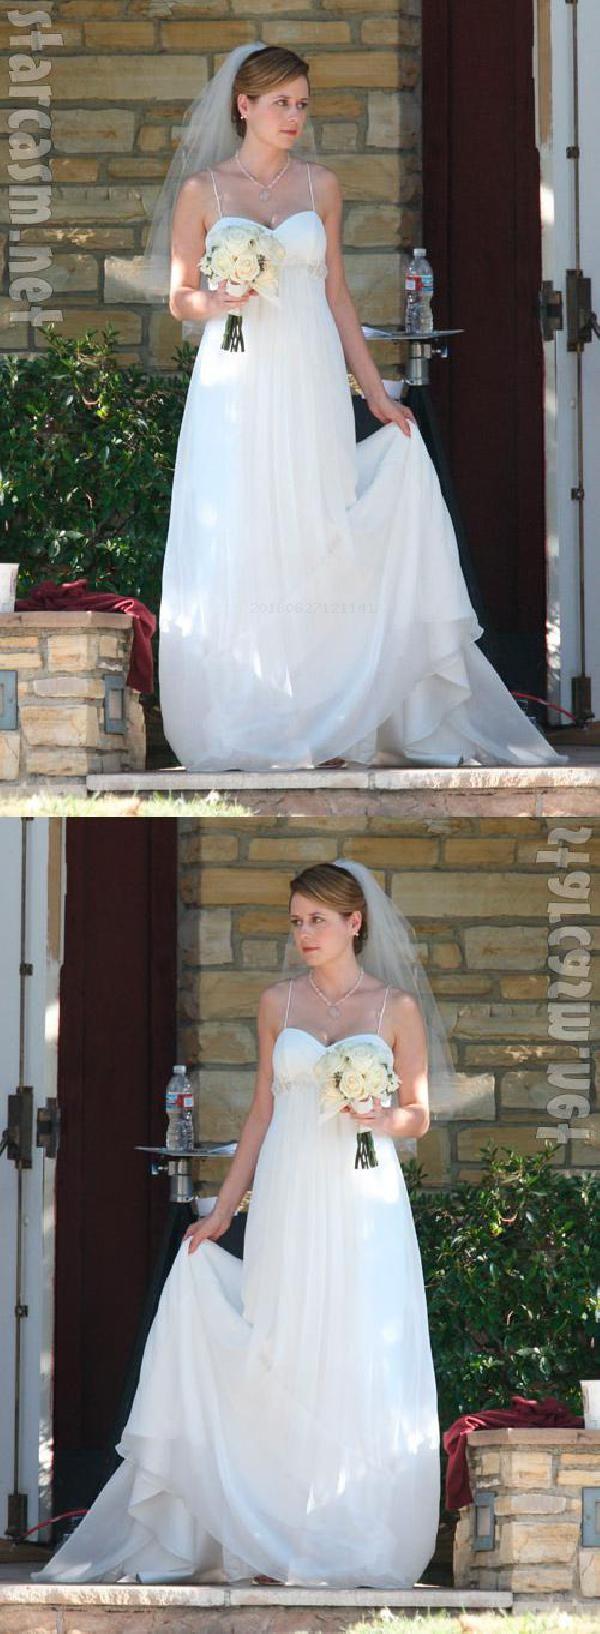 Handmade wedding dress  White Dress Custom Made Dress SUPE  Wedding Dresses